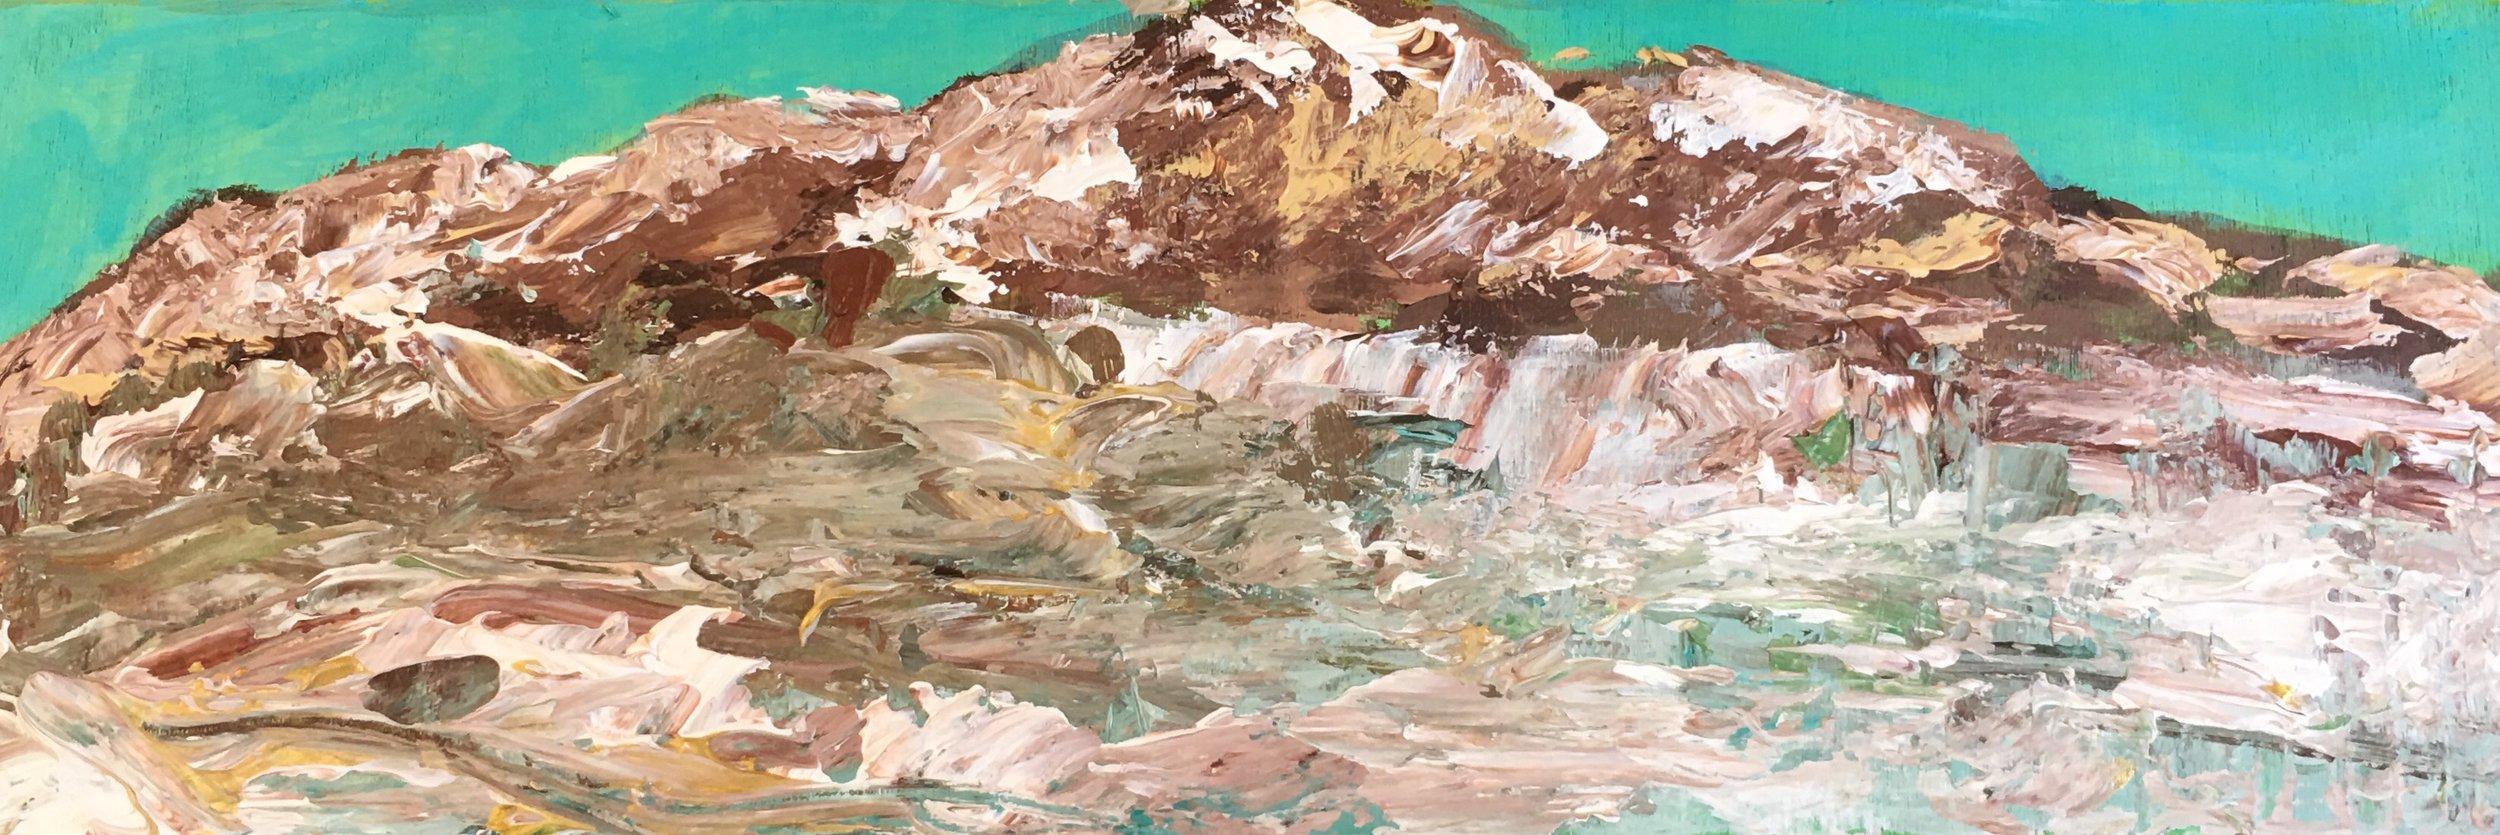 Artwork title: Alaska Arctic Circle Brooks Range Mountain Artist: Fan Lu ( Acrylic on Wood, 3x9  inch)